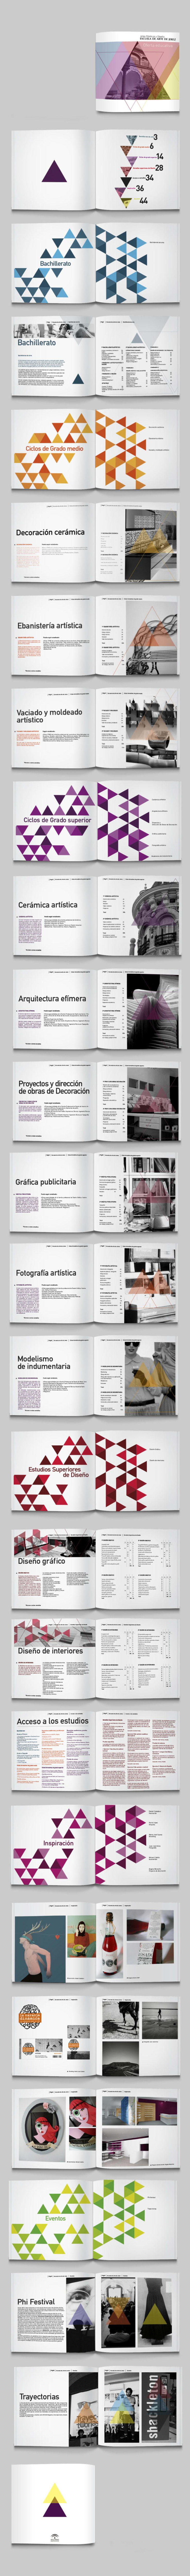 Catálogo de estudios -1